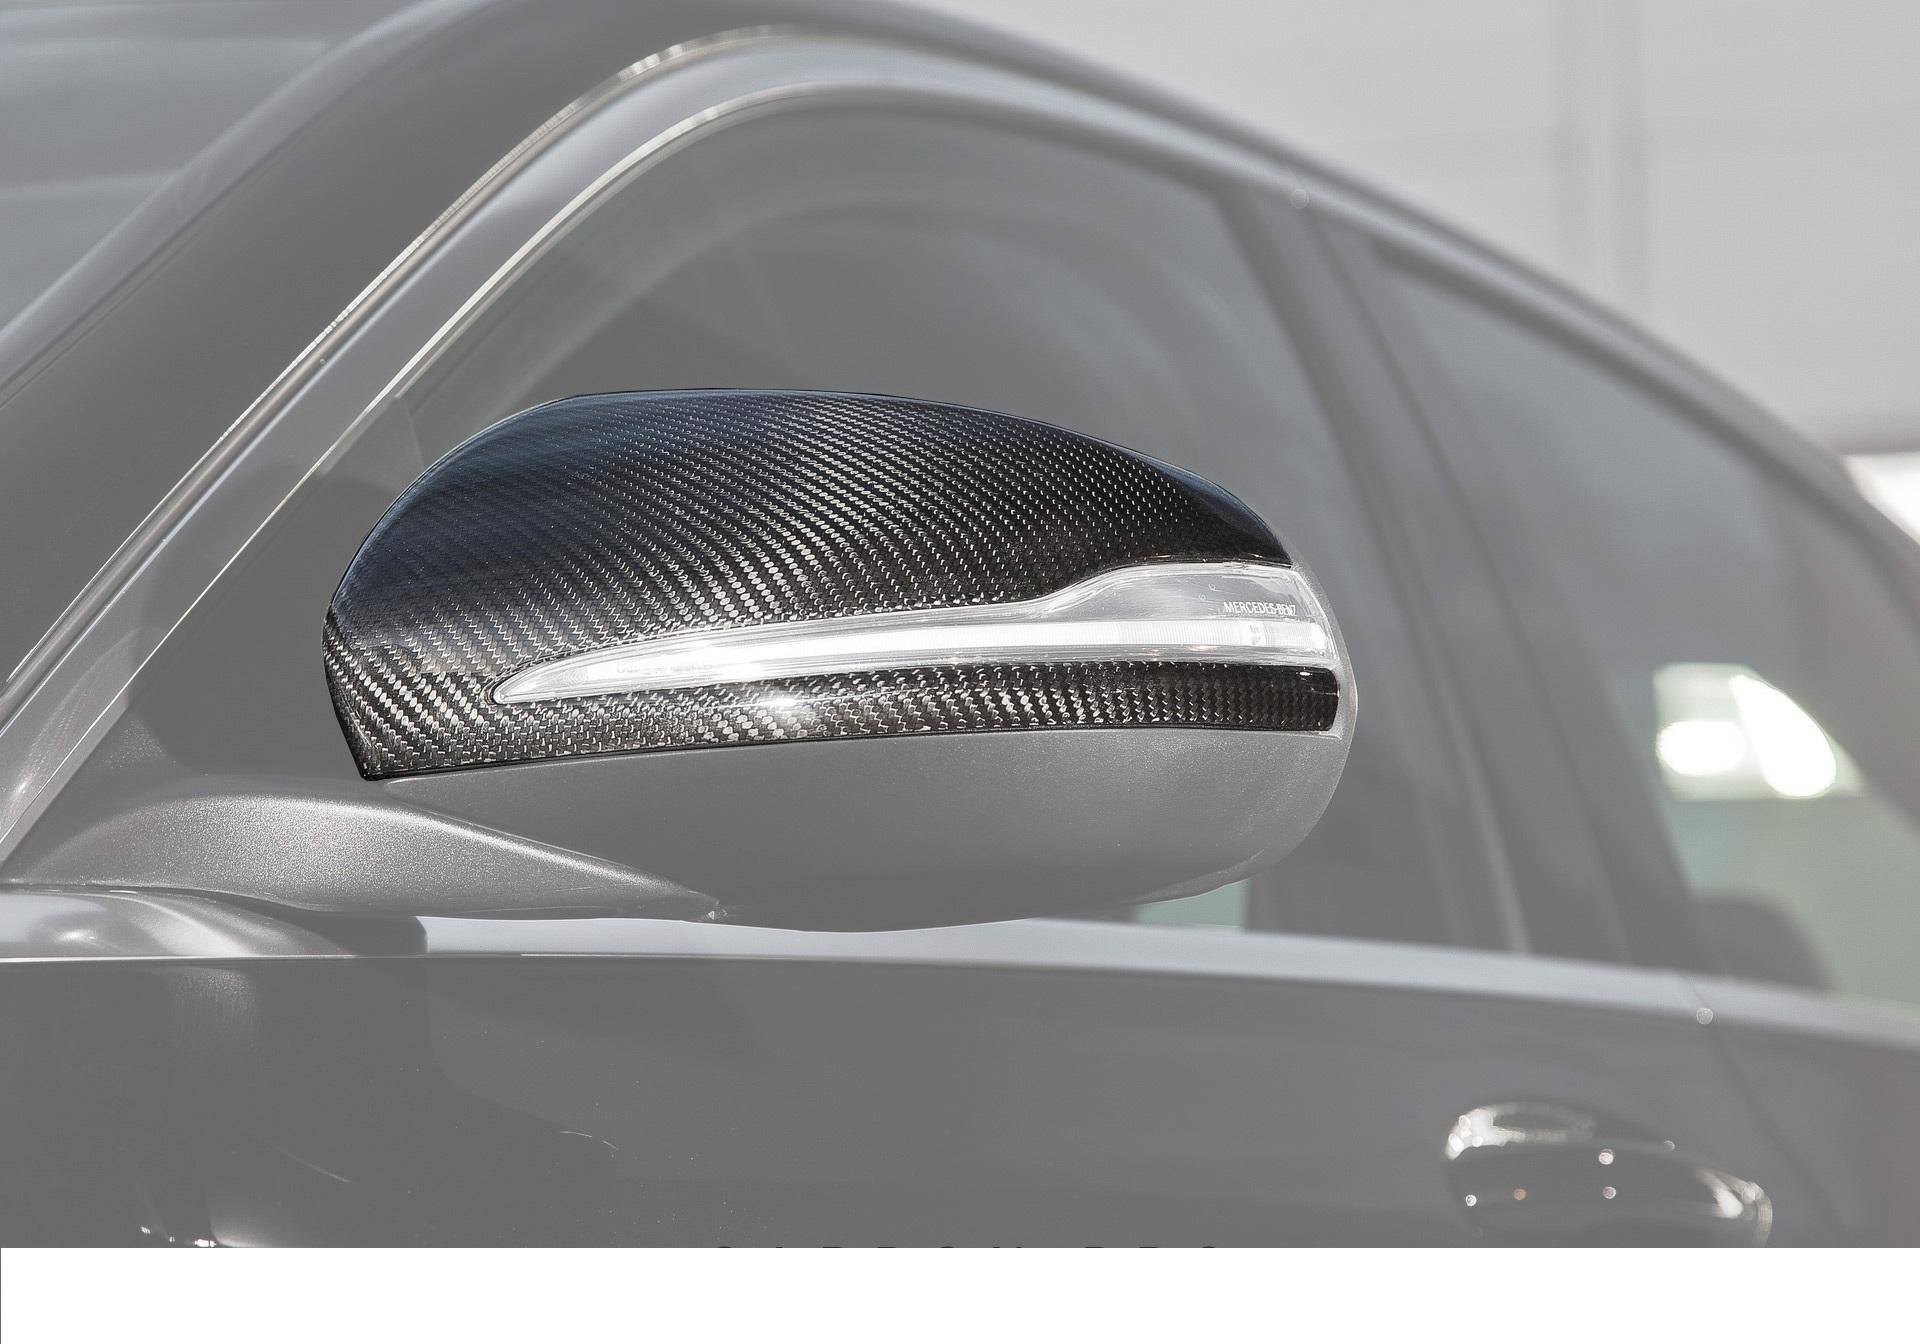 Карбоновые накладки на зеркала Brabus Style для Mercedes С-class W205